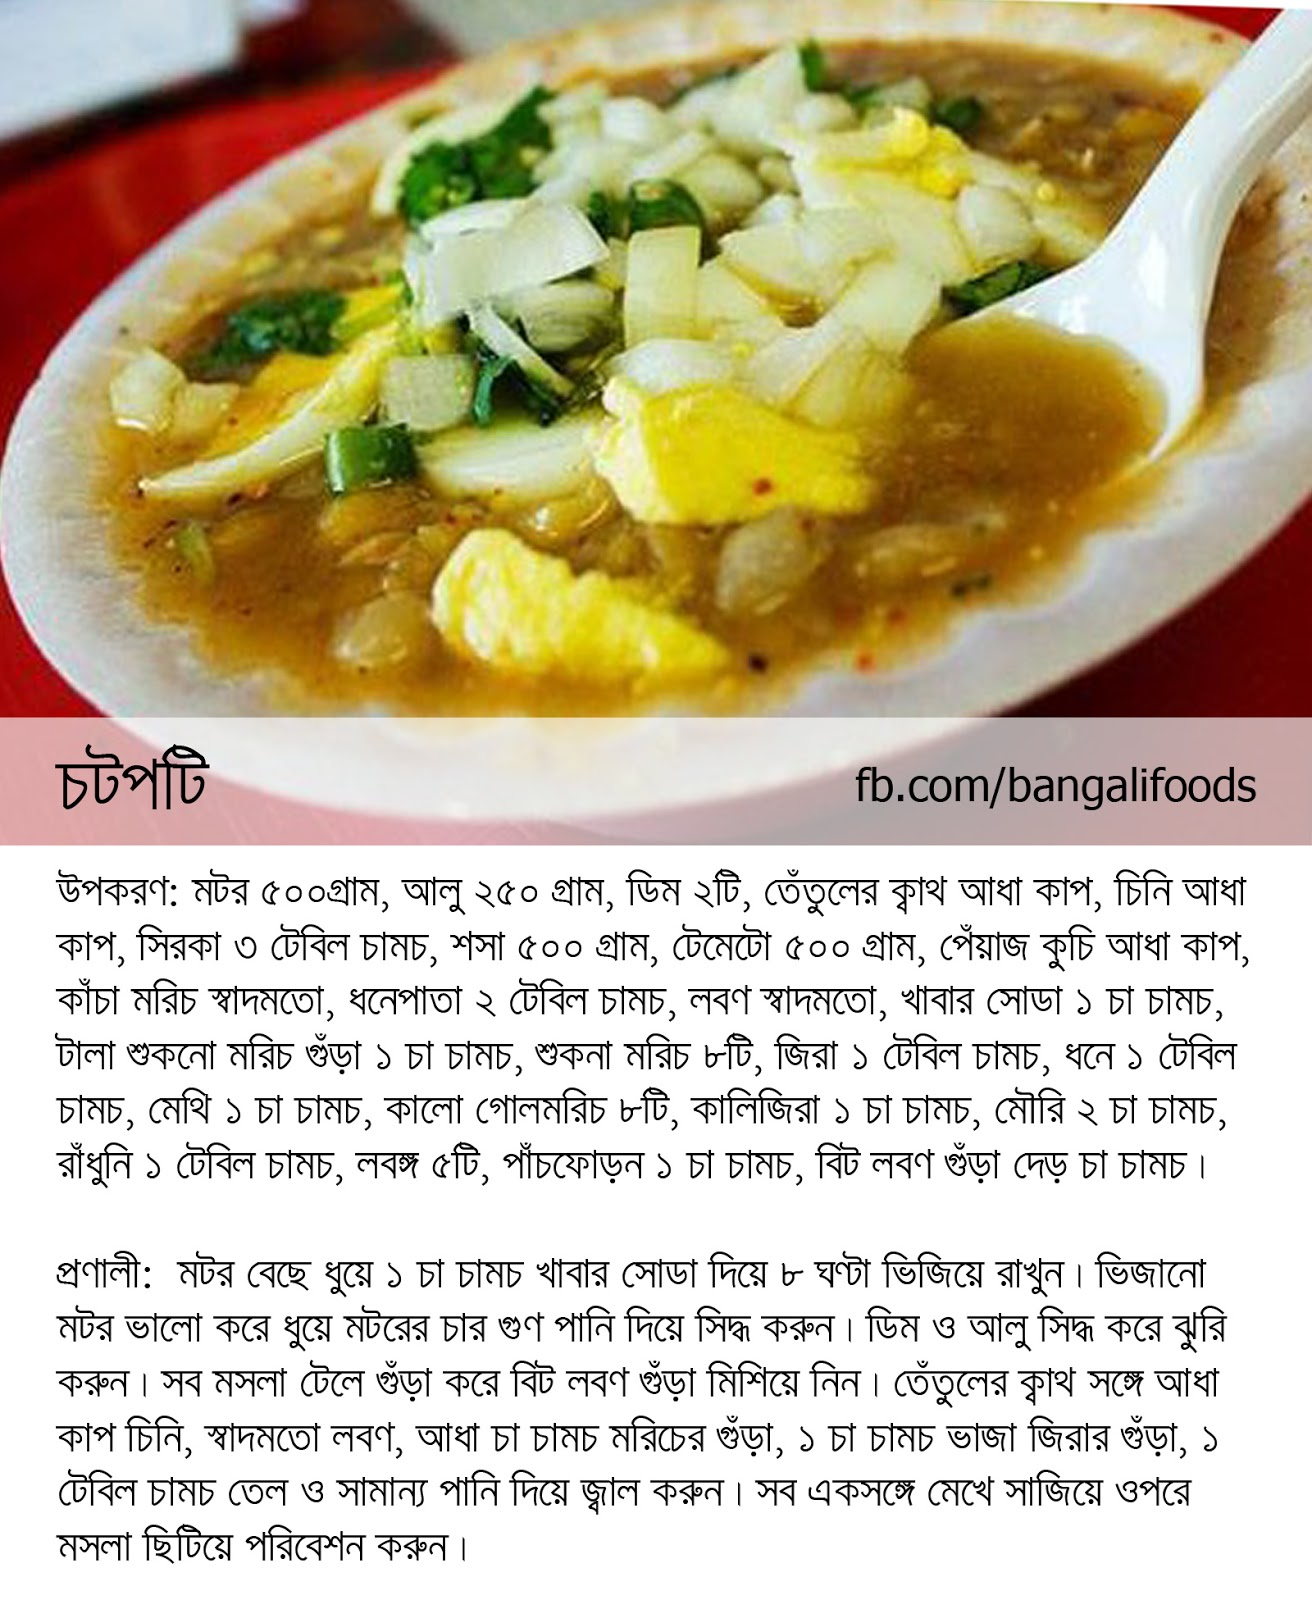 Bangali foods chotpoti recipe in bangla tasty and mouthwatering chotpoti recipe 03 in bengali forumfinder Gallery